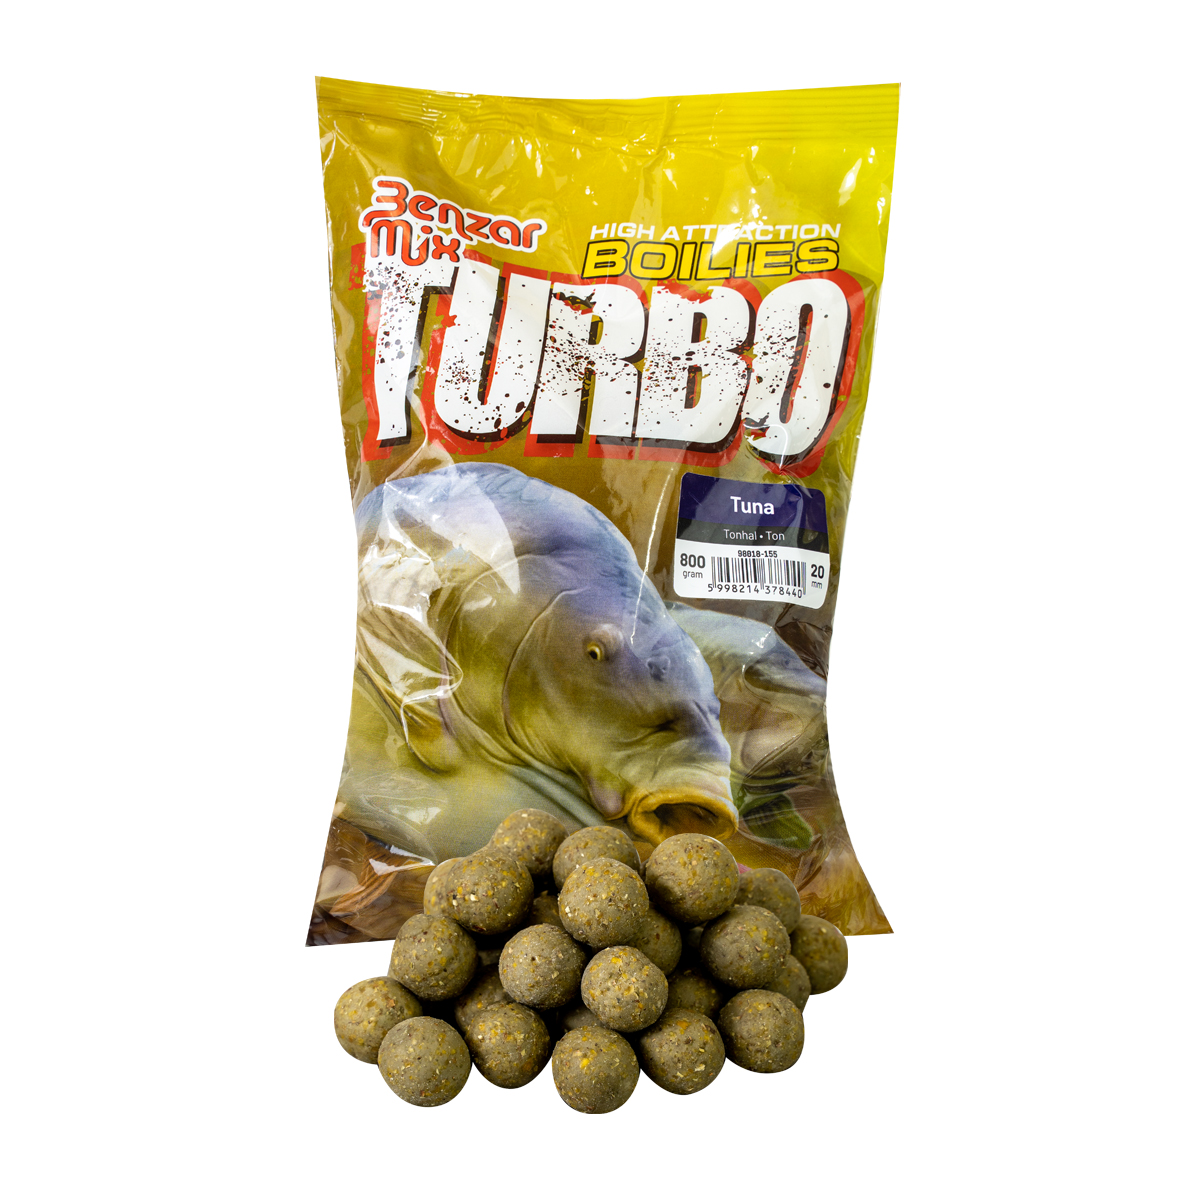 BENZAR TURBO BOILIE 800G 20MM TONHAL